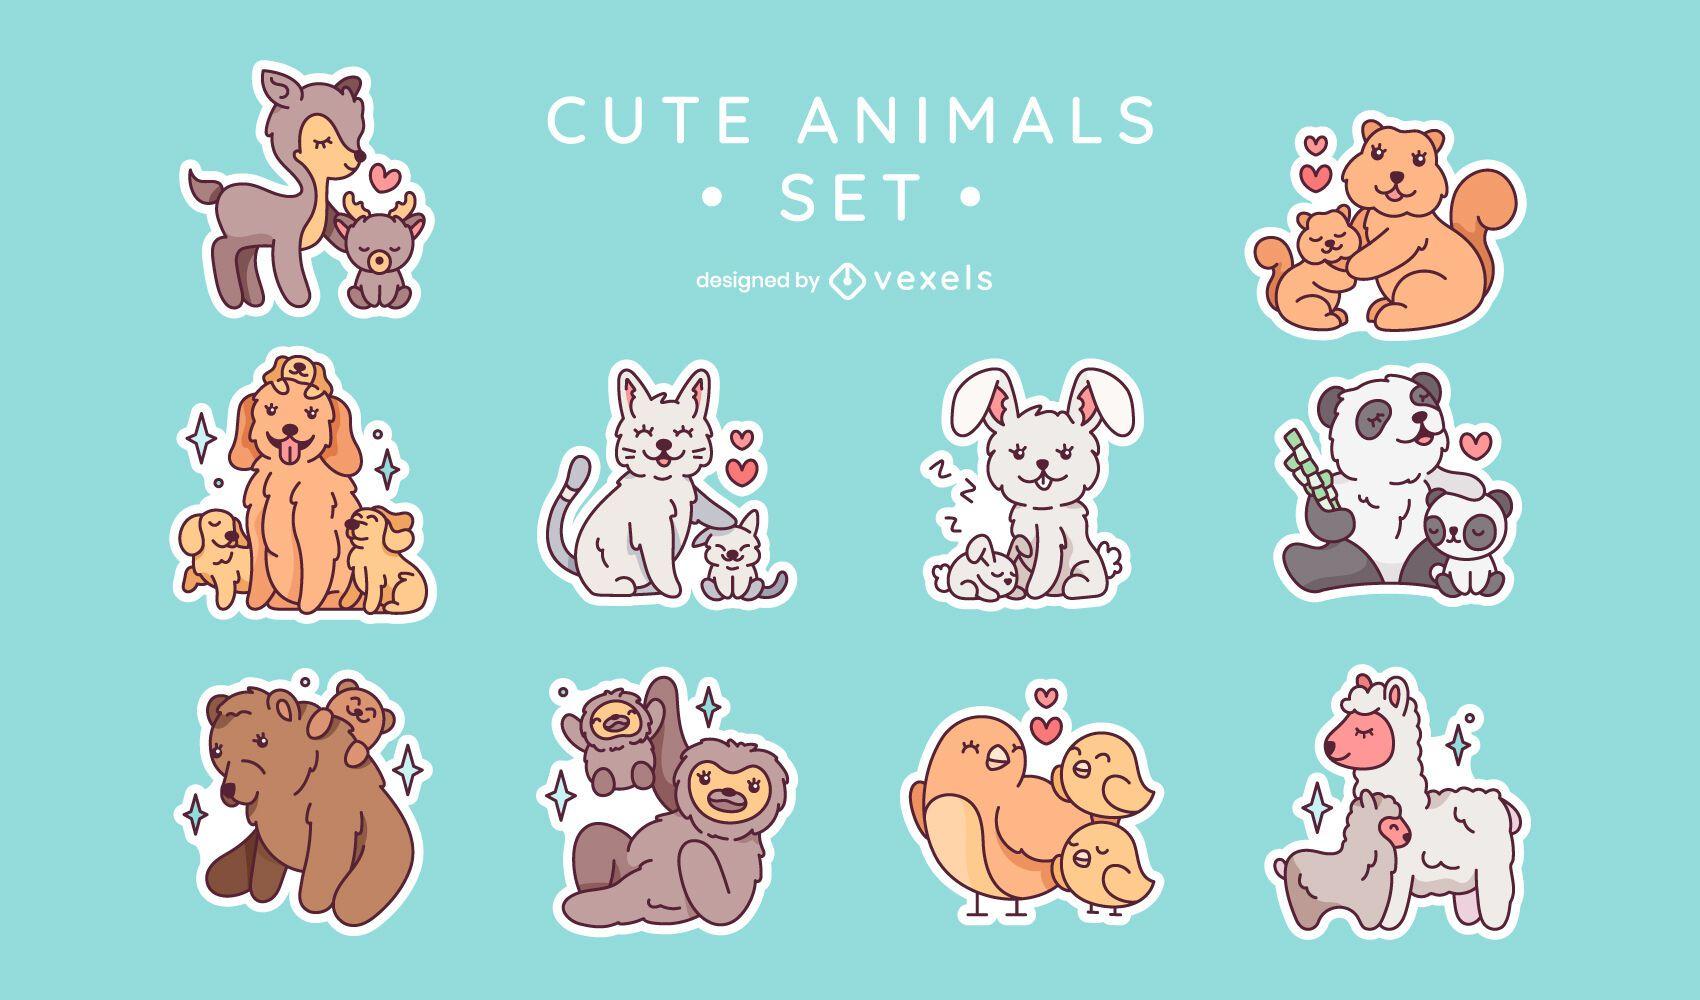 Cute animal family sticker set